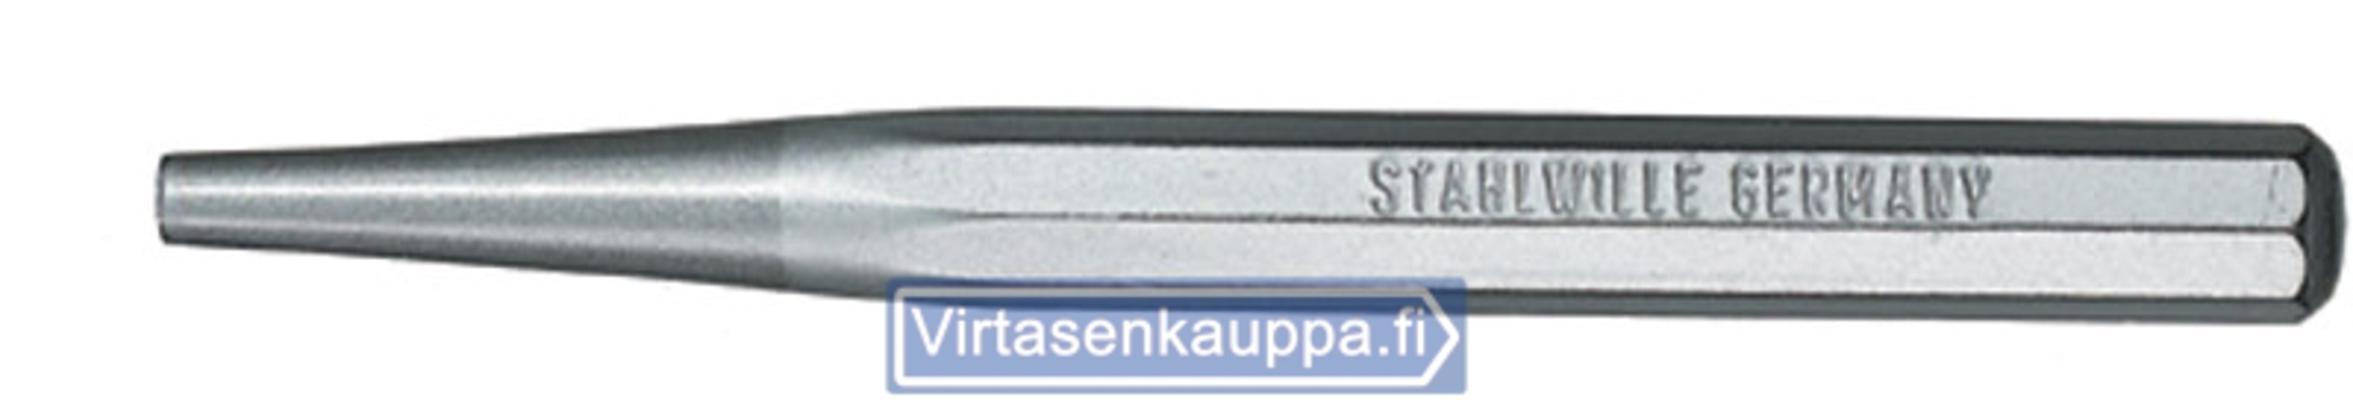 Kartiotuurna 4 mm, Stahlwille - Kartiotuurna 4 mm